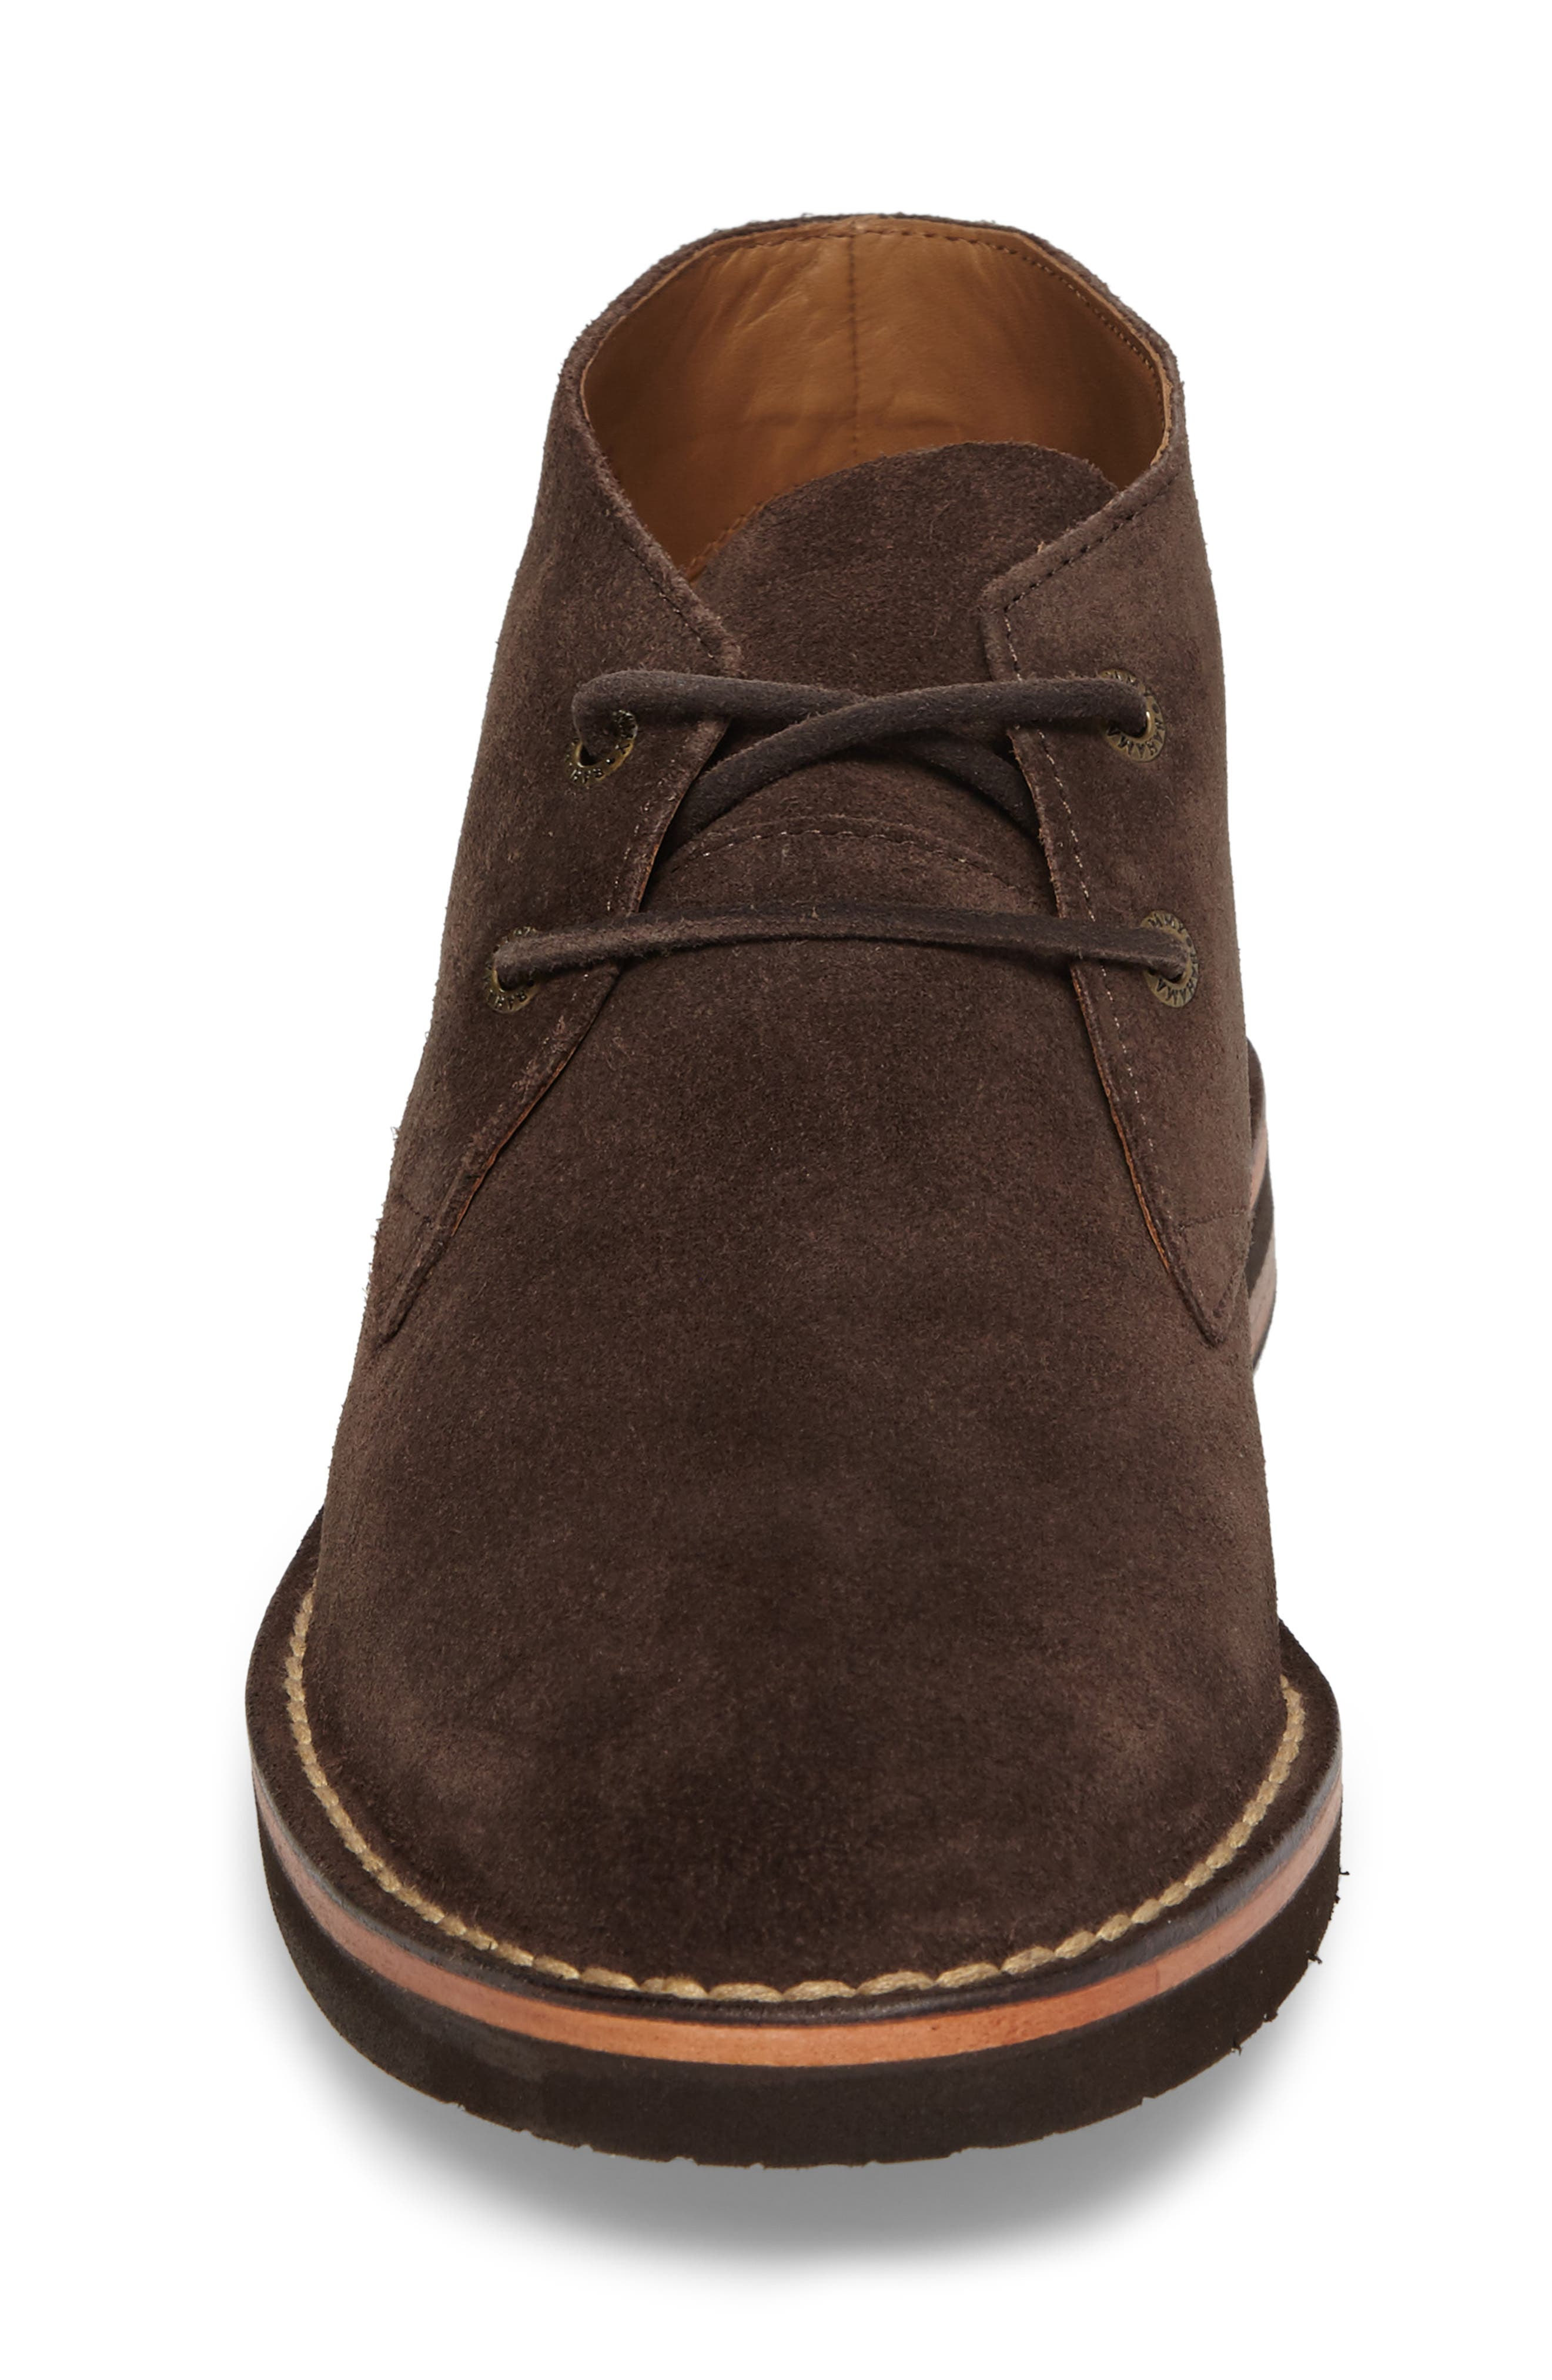 Nassau Chukka Boot,                             Alternate thumbnail 4, color,                             Dark Brown Suede